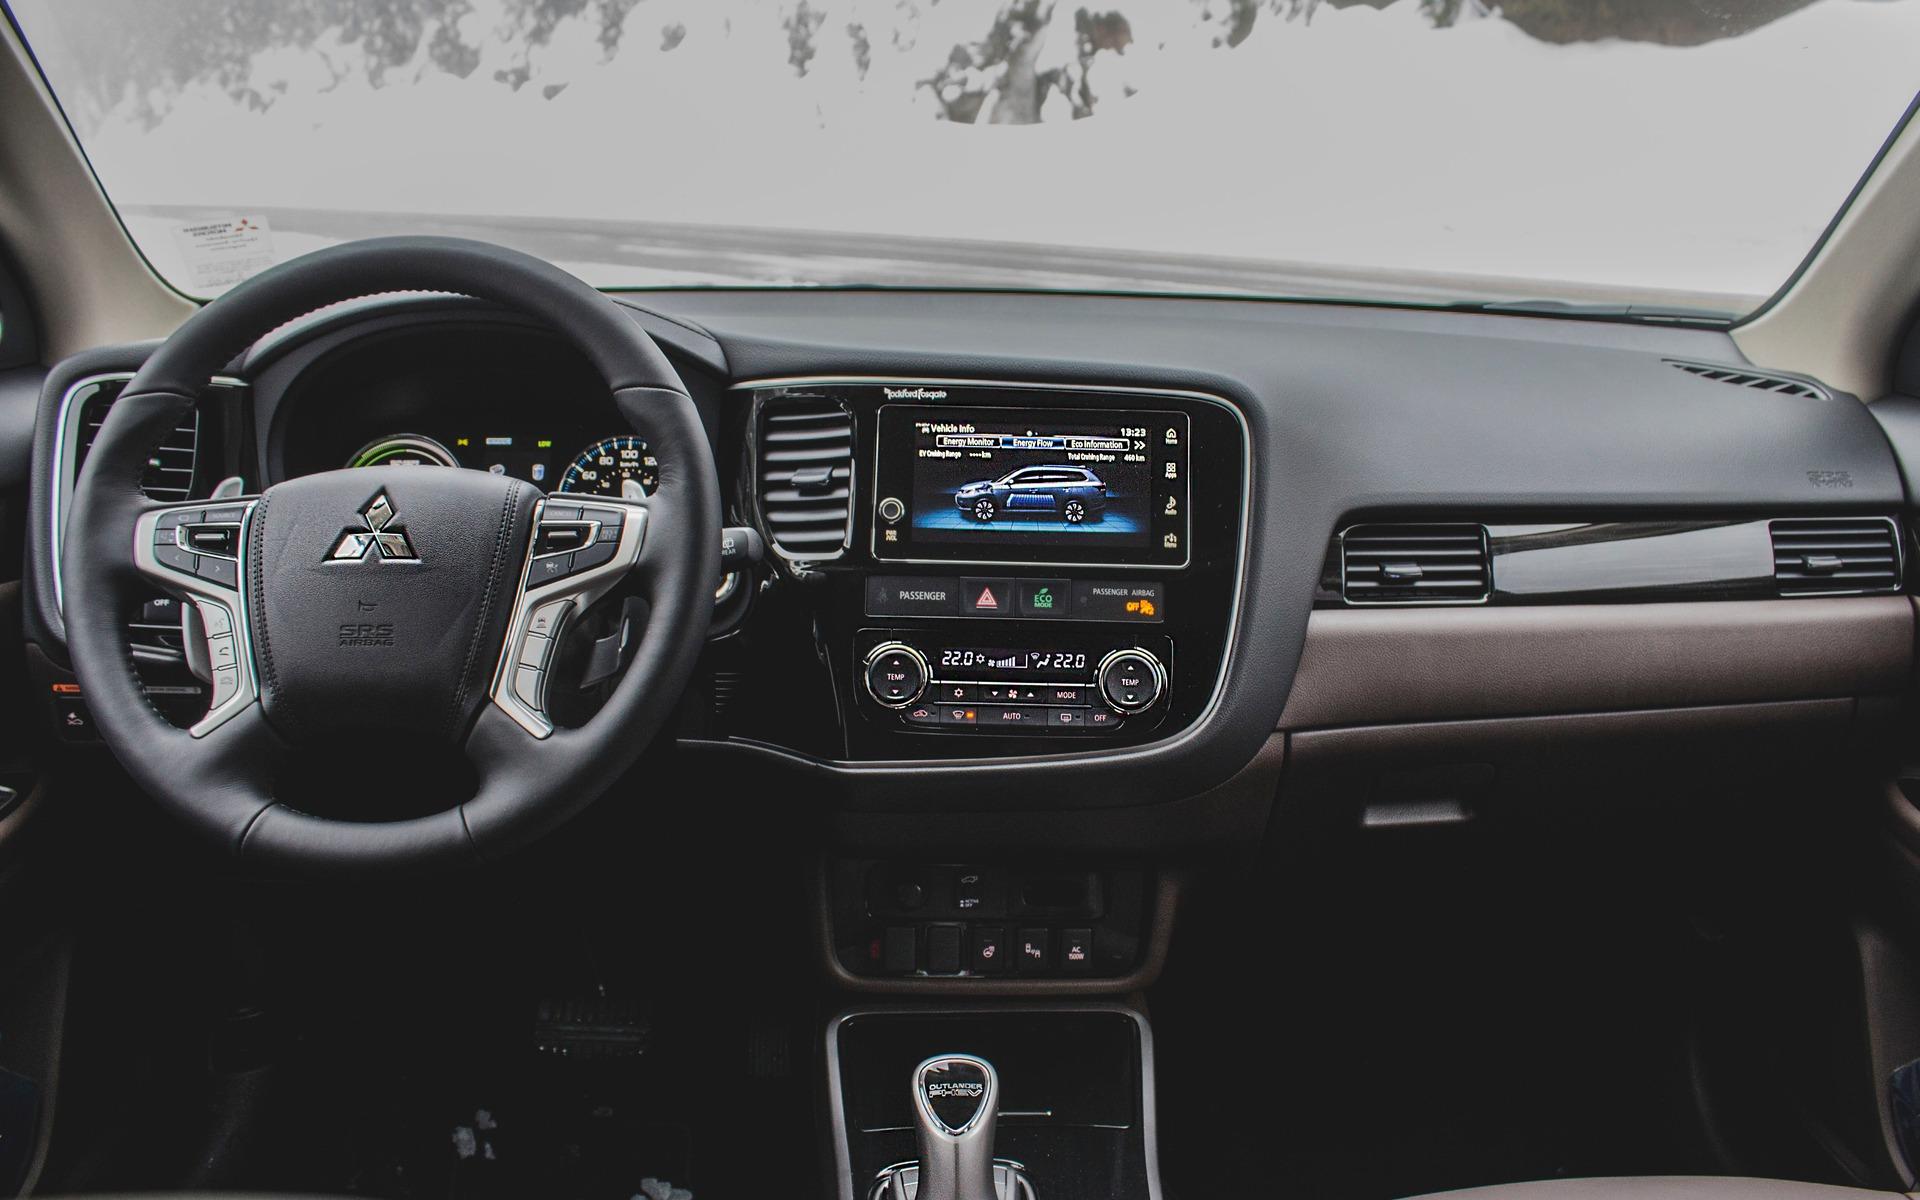 <p>Interior of the 2018 Mitsubishi Outlander PHEV</p>